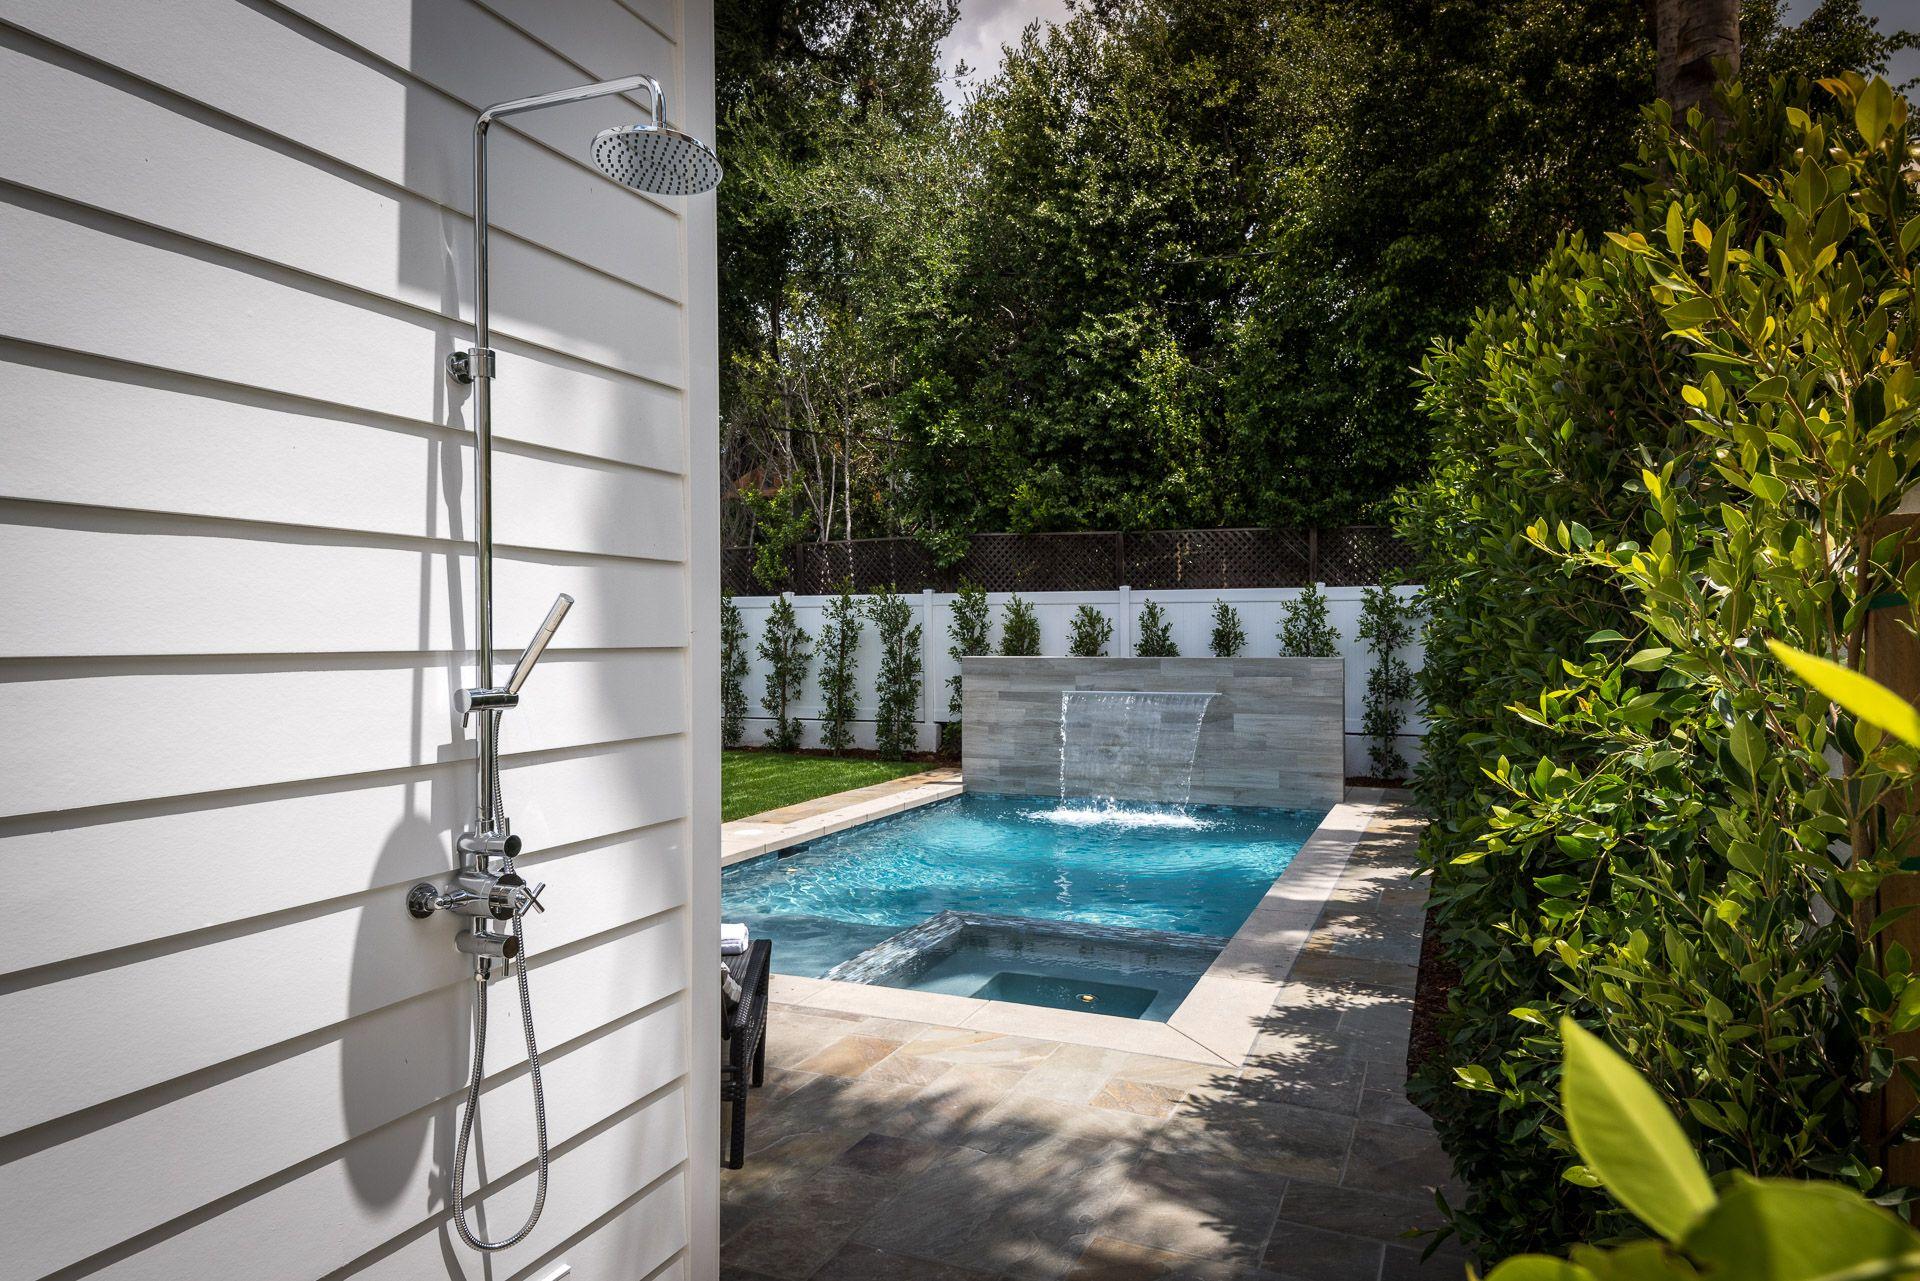 outdoor shower 4054 beck avenue studio city ca 91604 pinterest